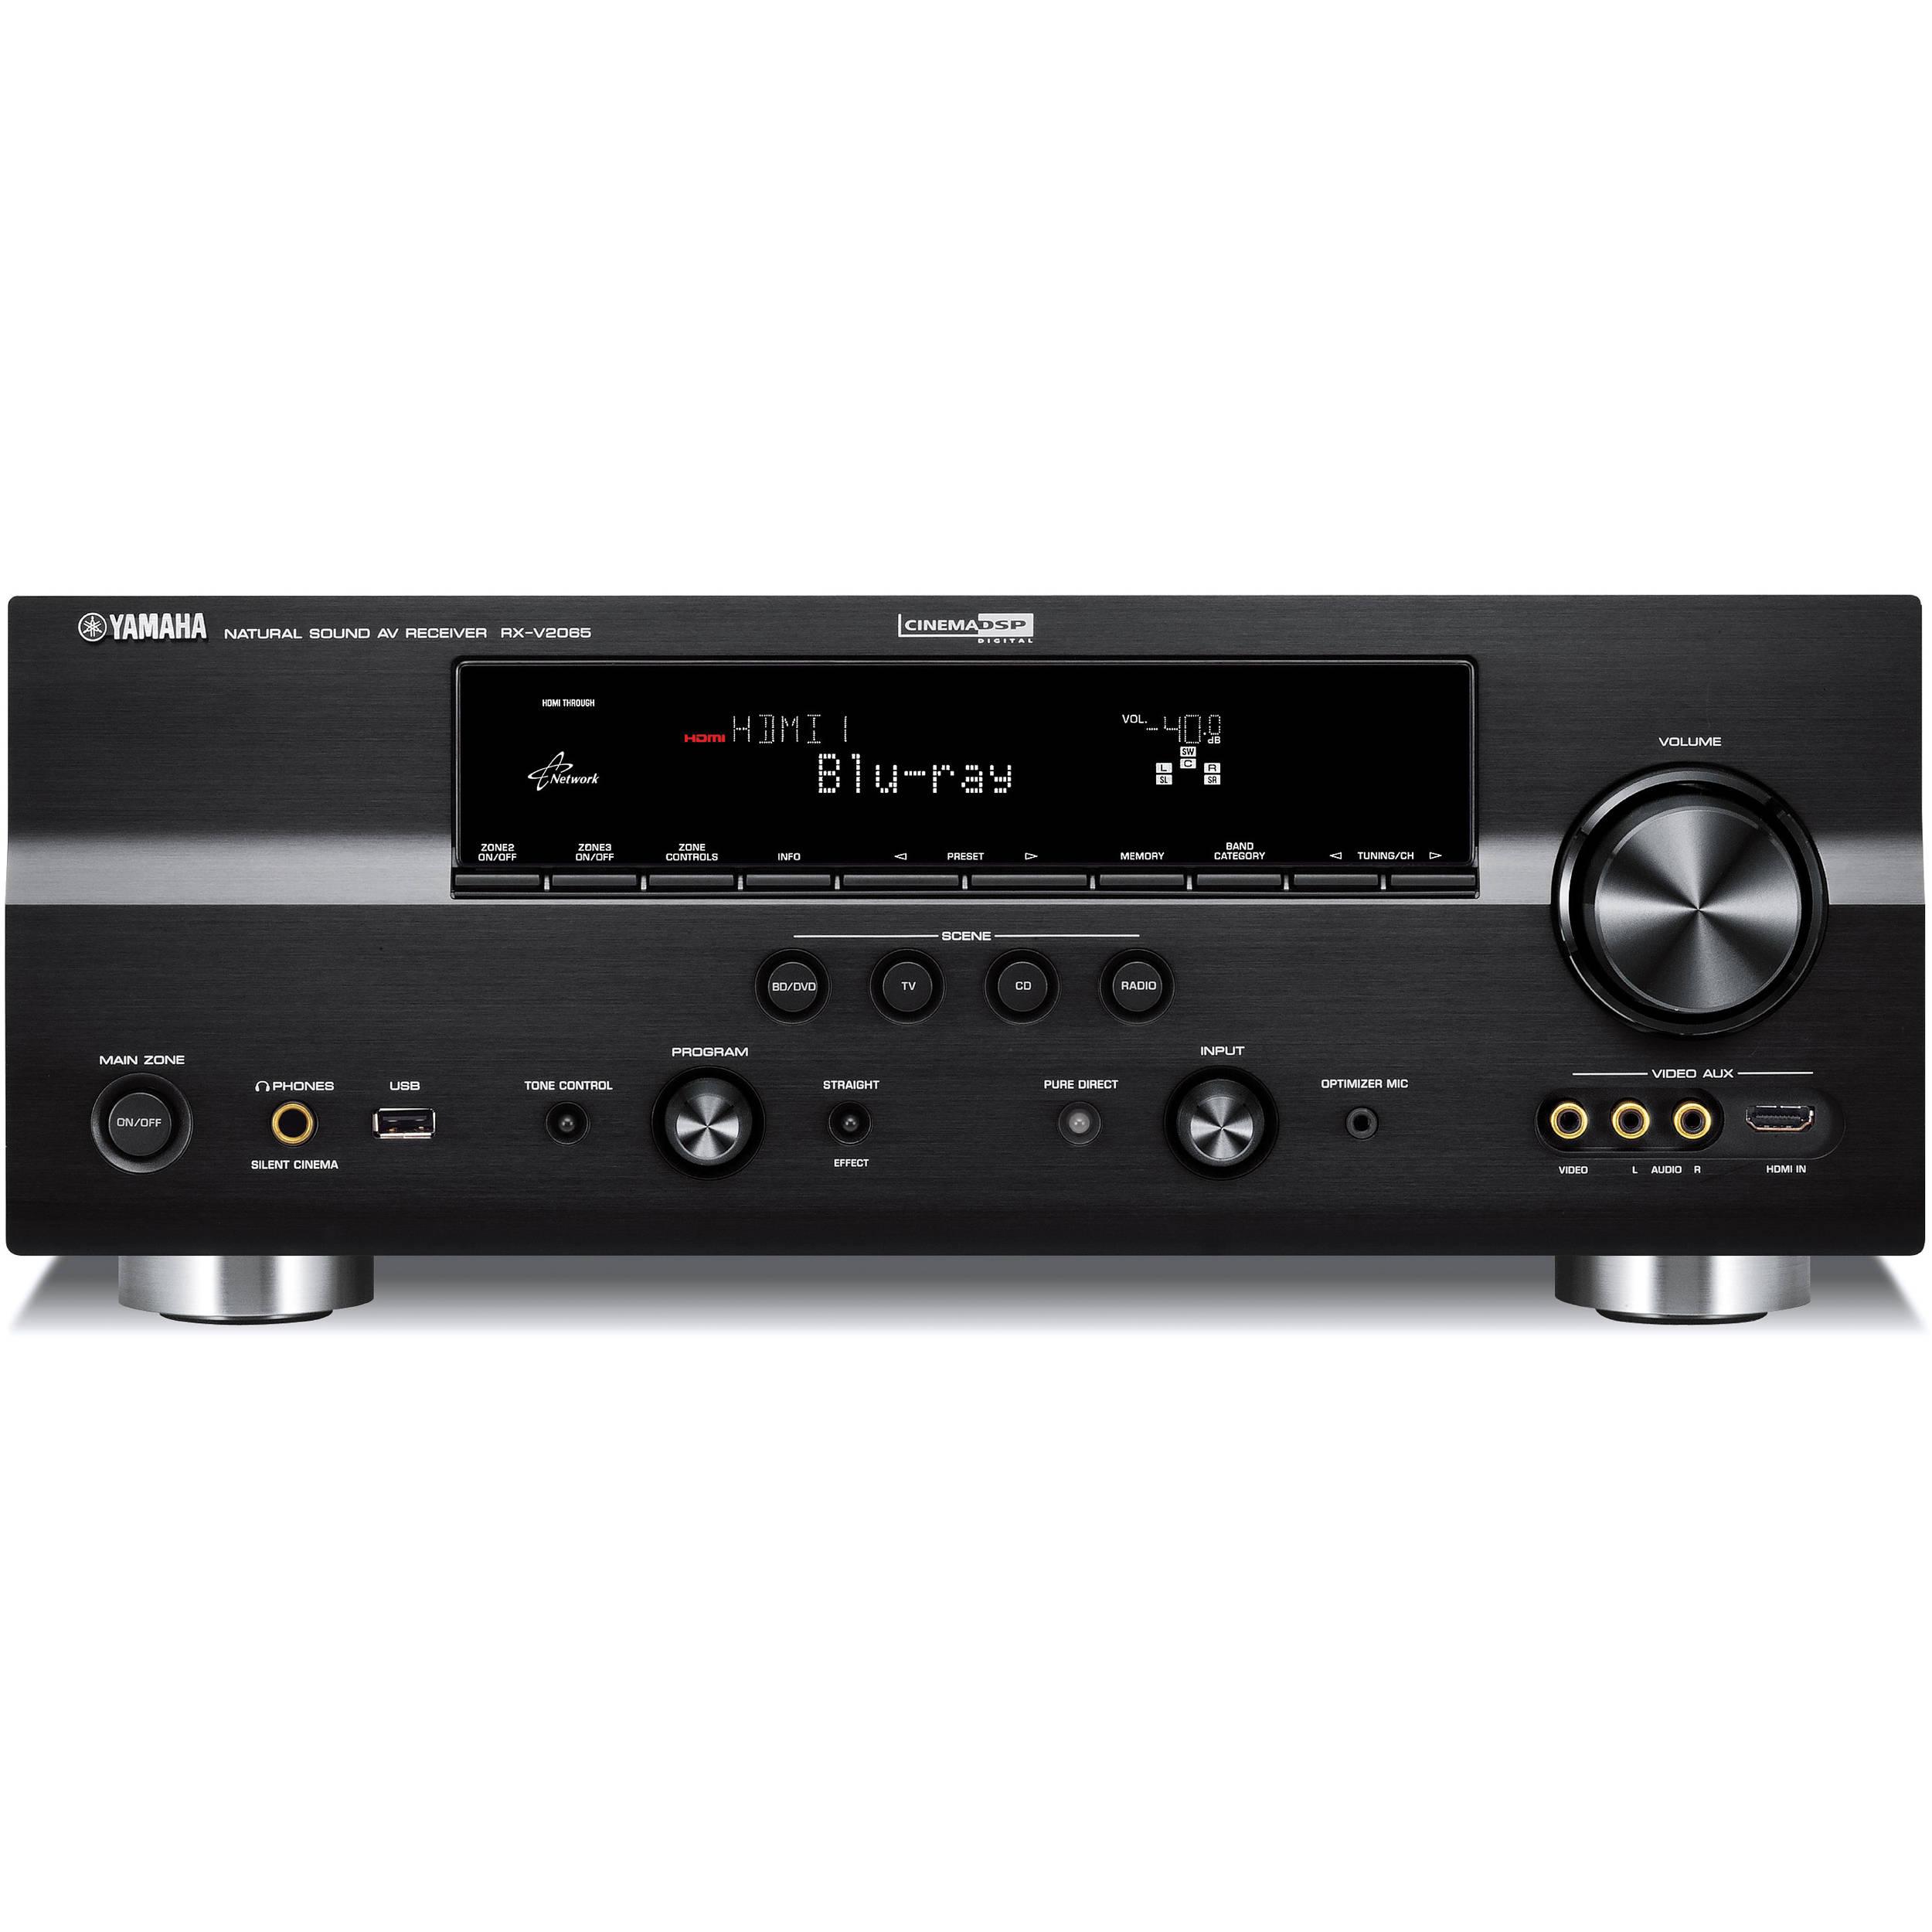 Yamaha RX-V2065BL 7 2-Channel Network Digital Home Theater Receiver (Black)